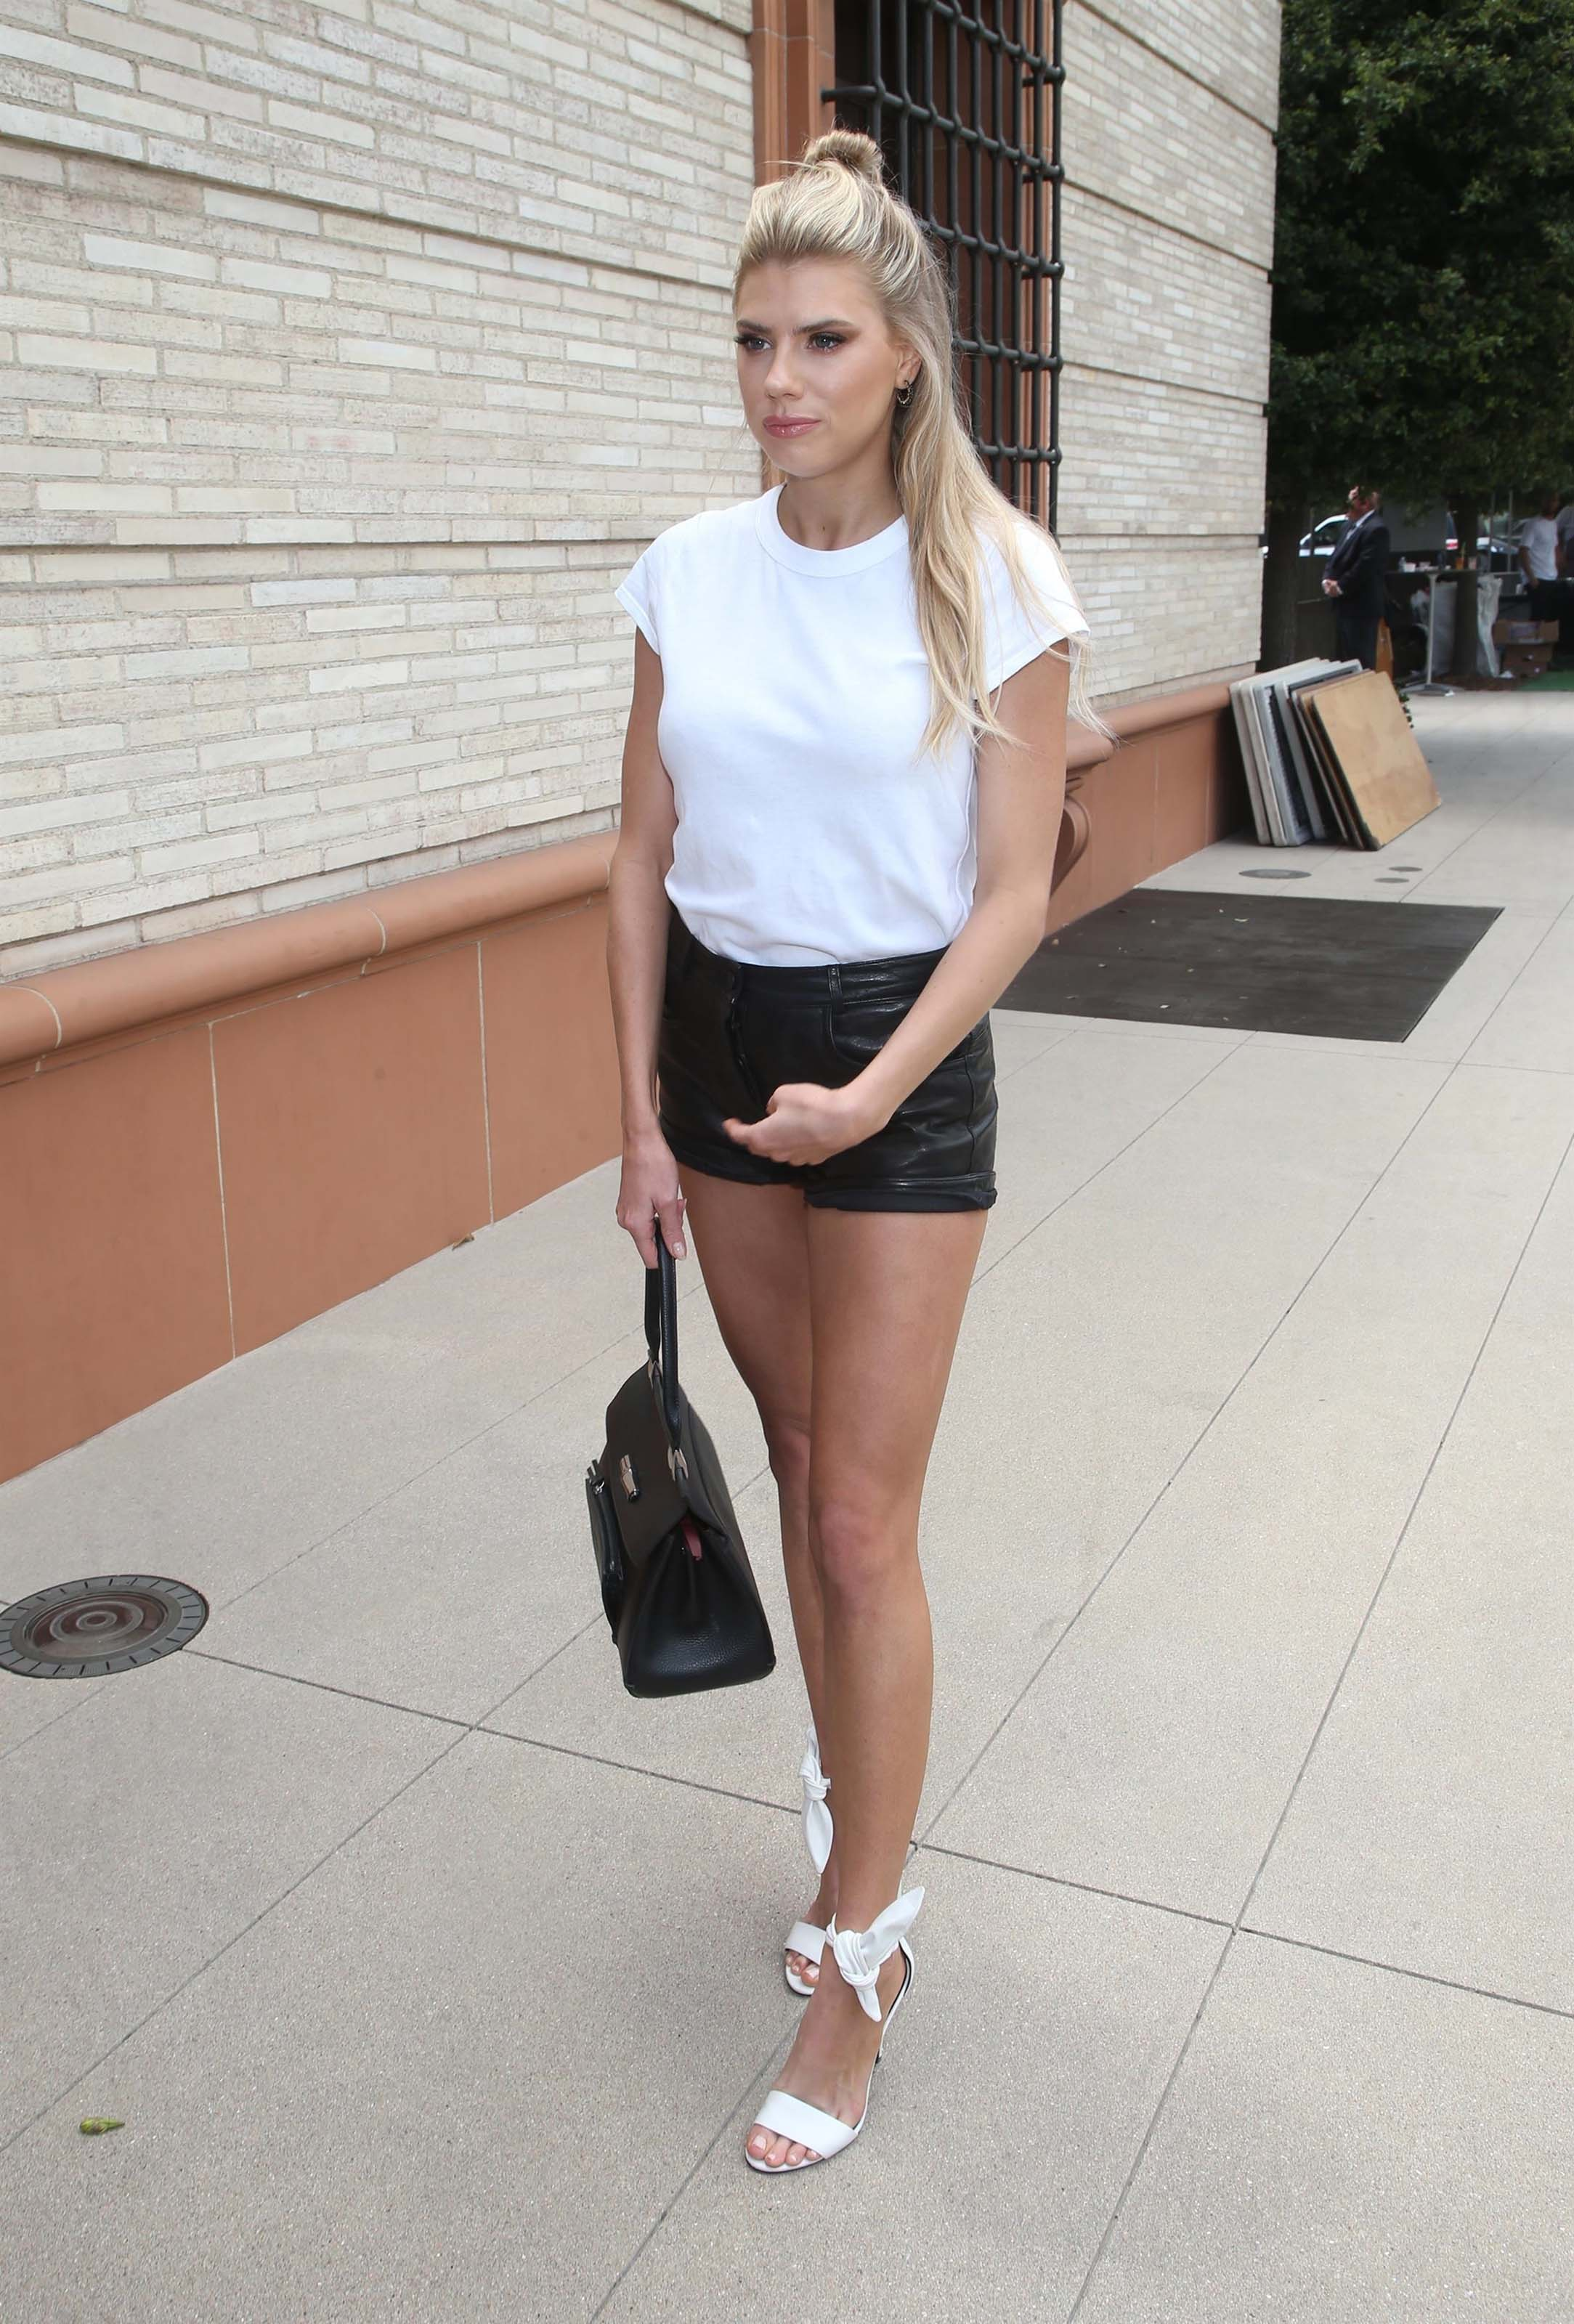 Charlotte McKinney attends Off The Menu & Postmates